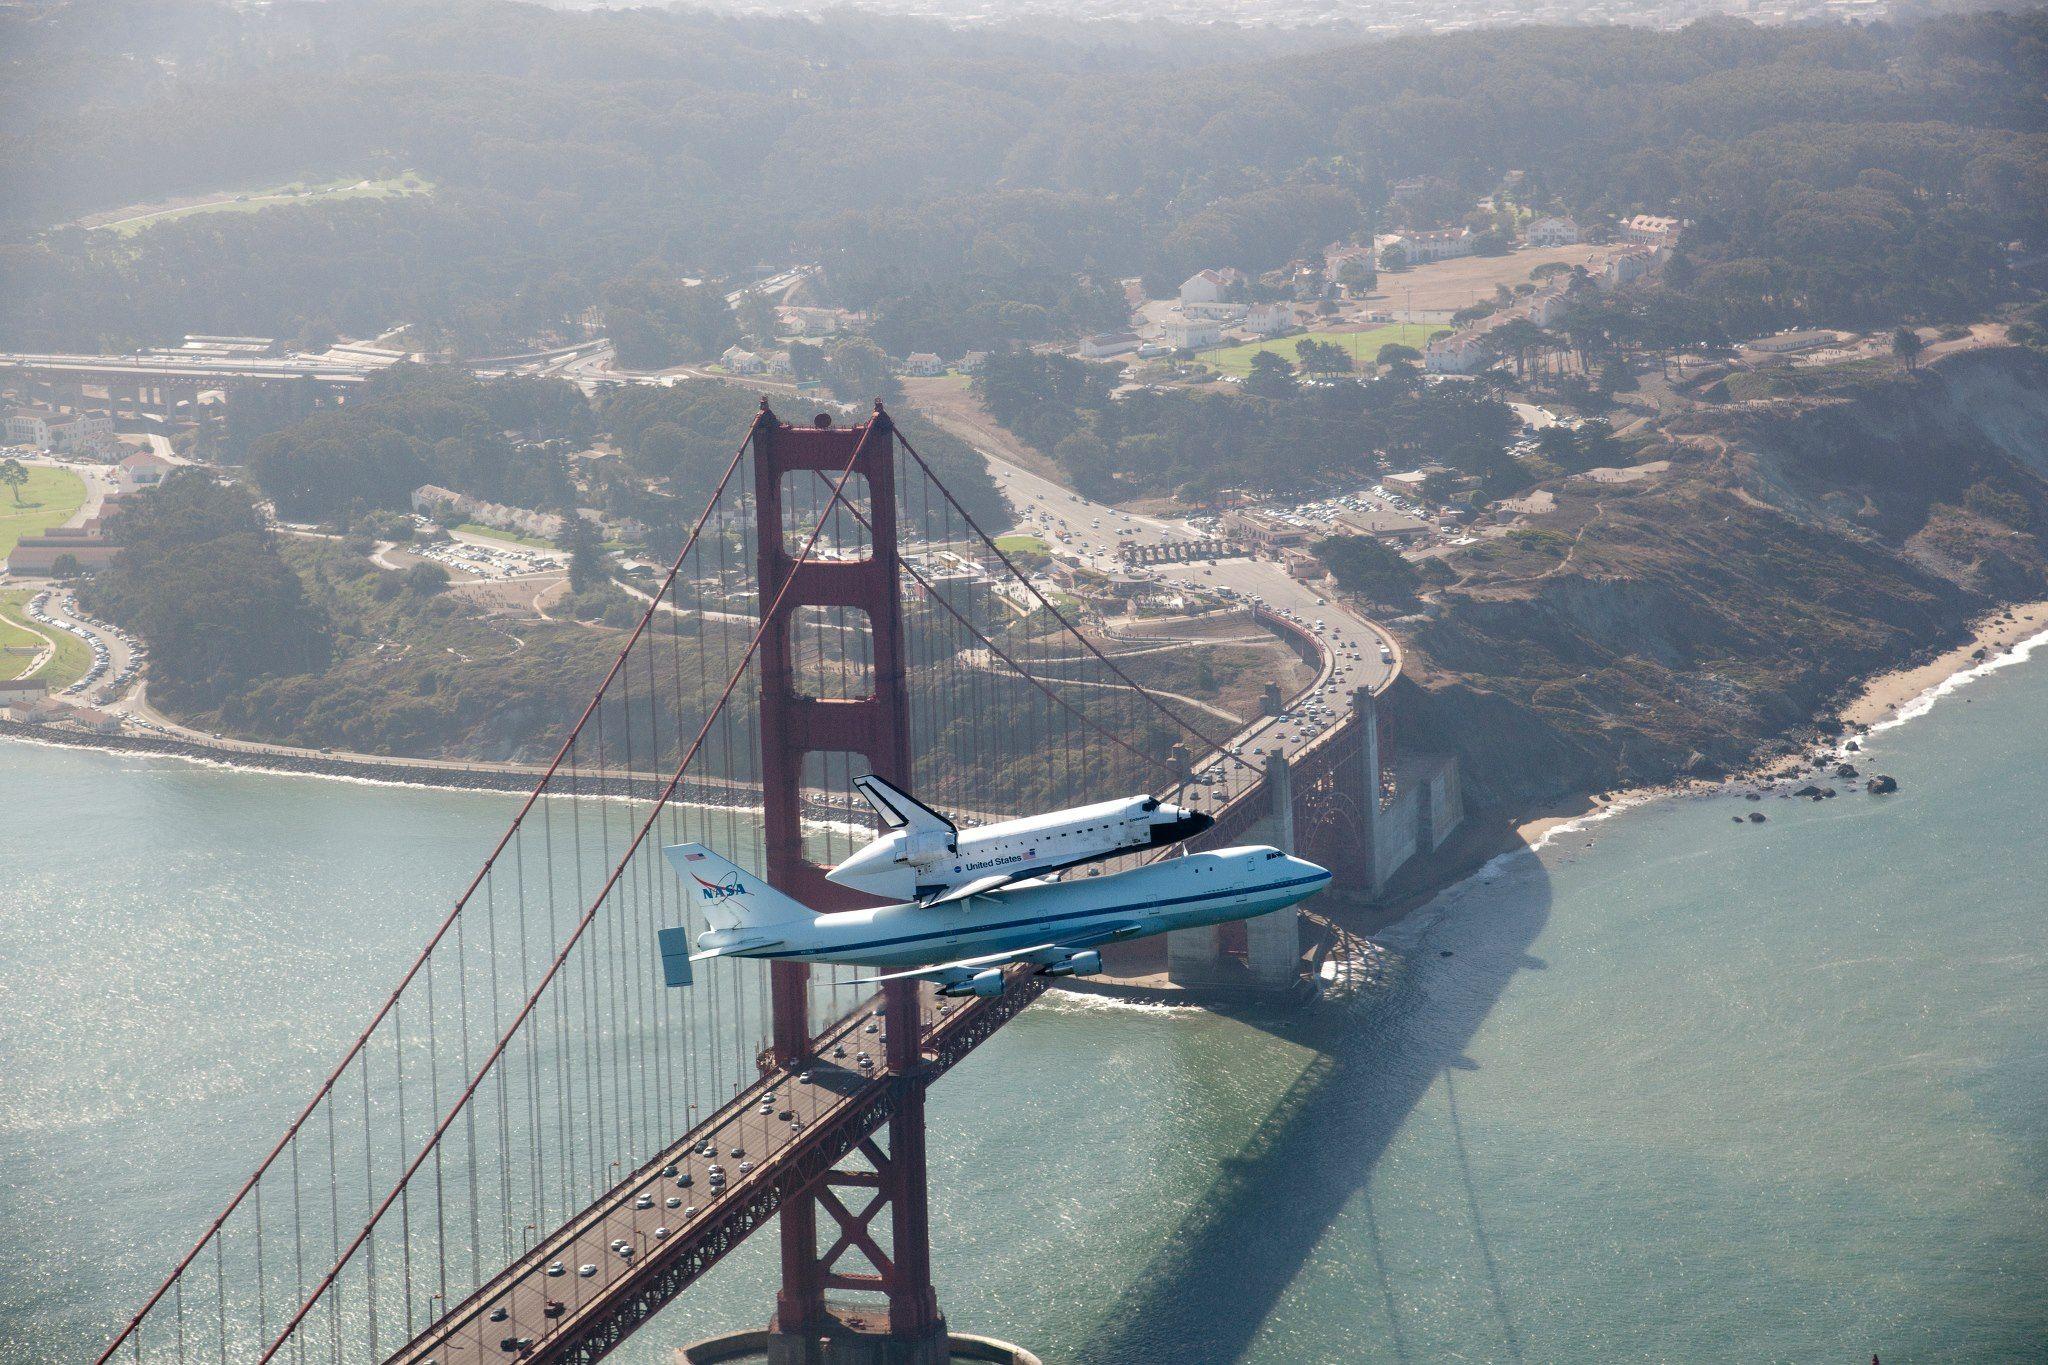 Endeavour over Golden Gate bridge  SEPT. 2012